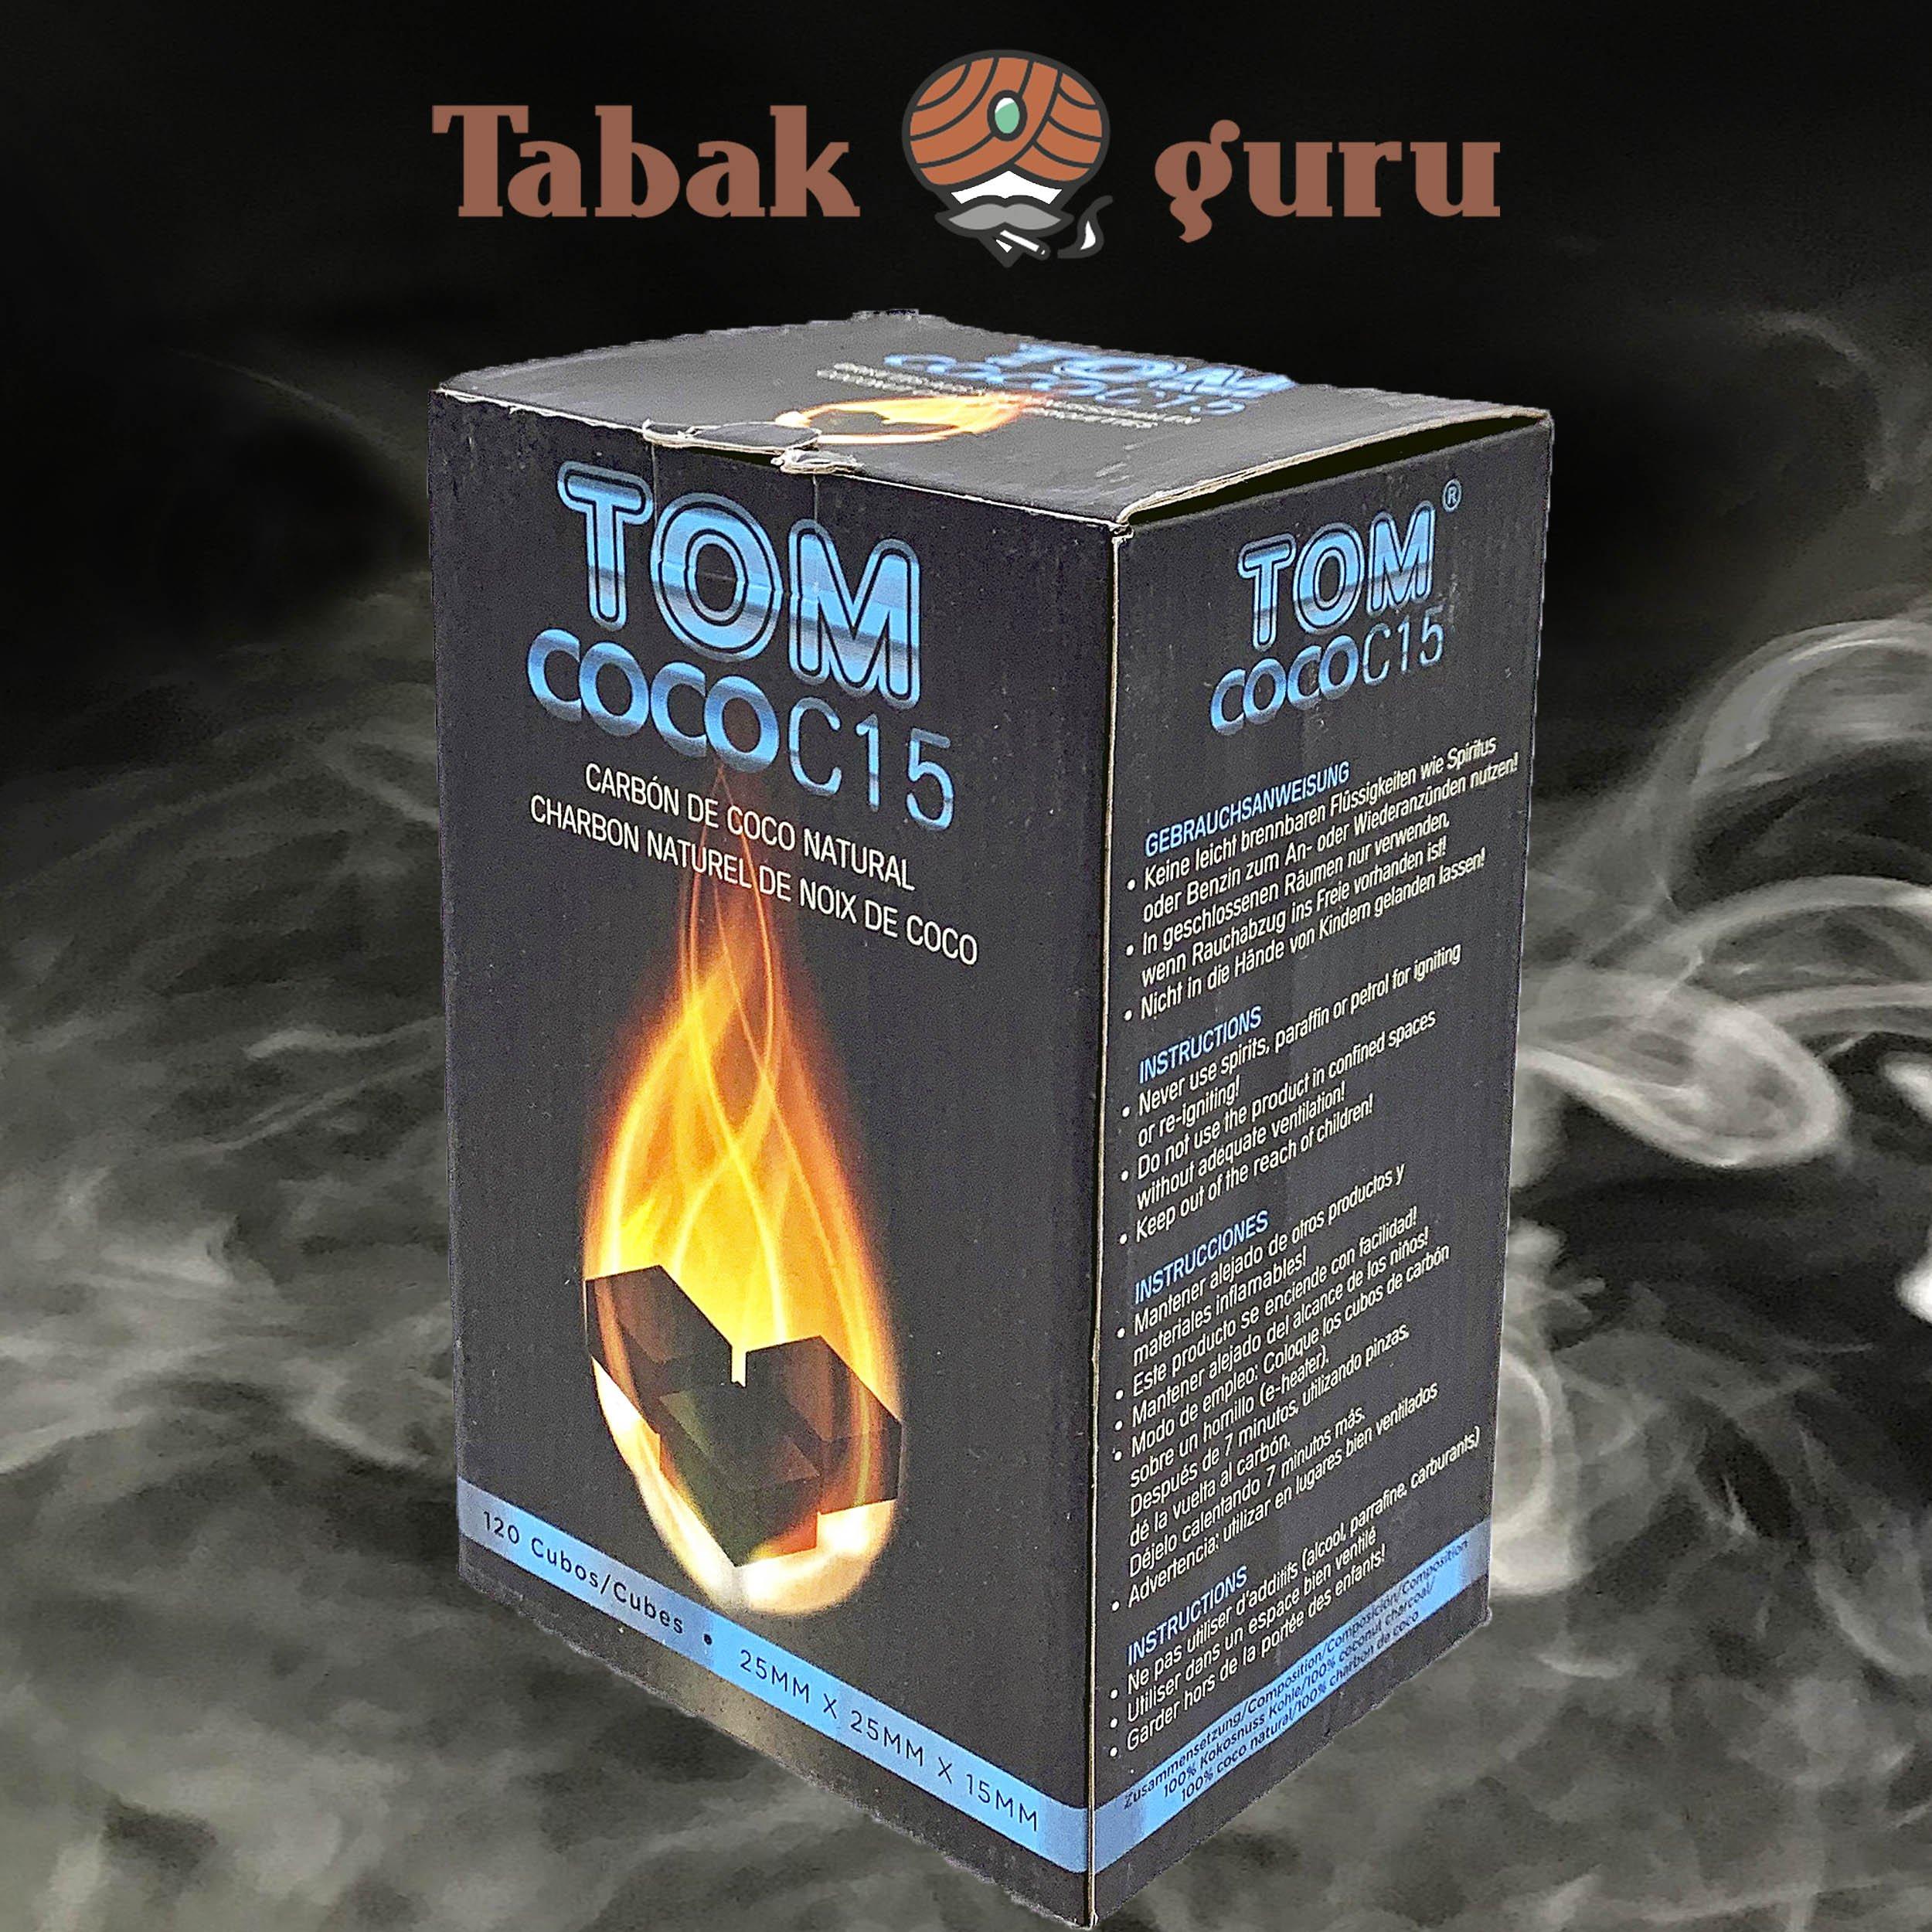 TOM Cococha Shishakohle / Wasserpfeifenkohle 1kg